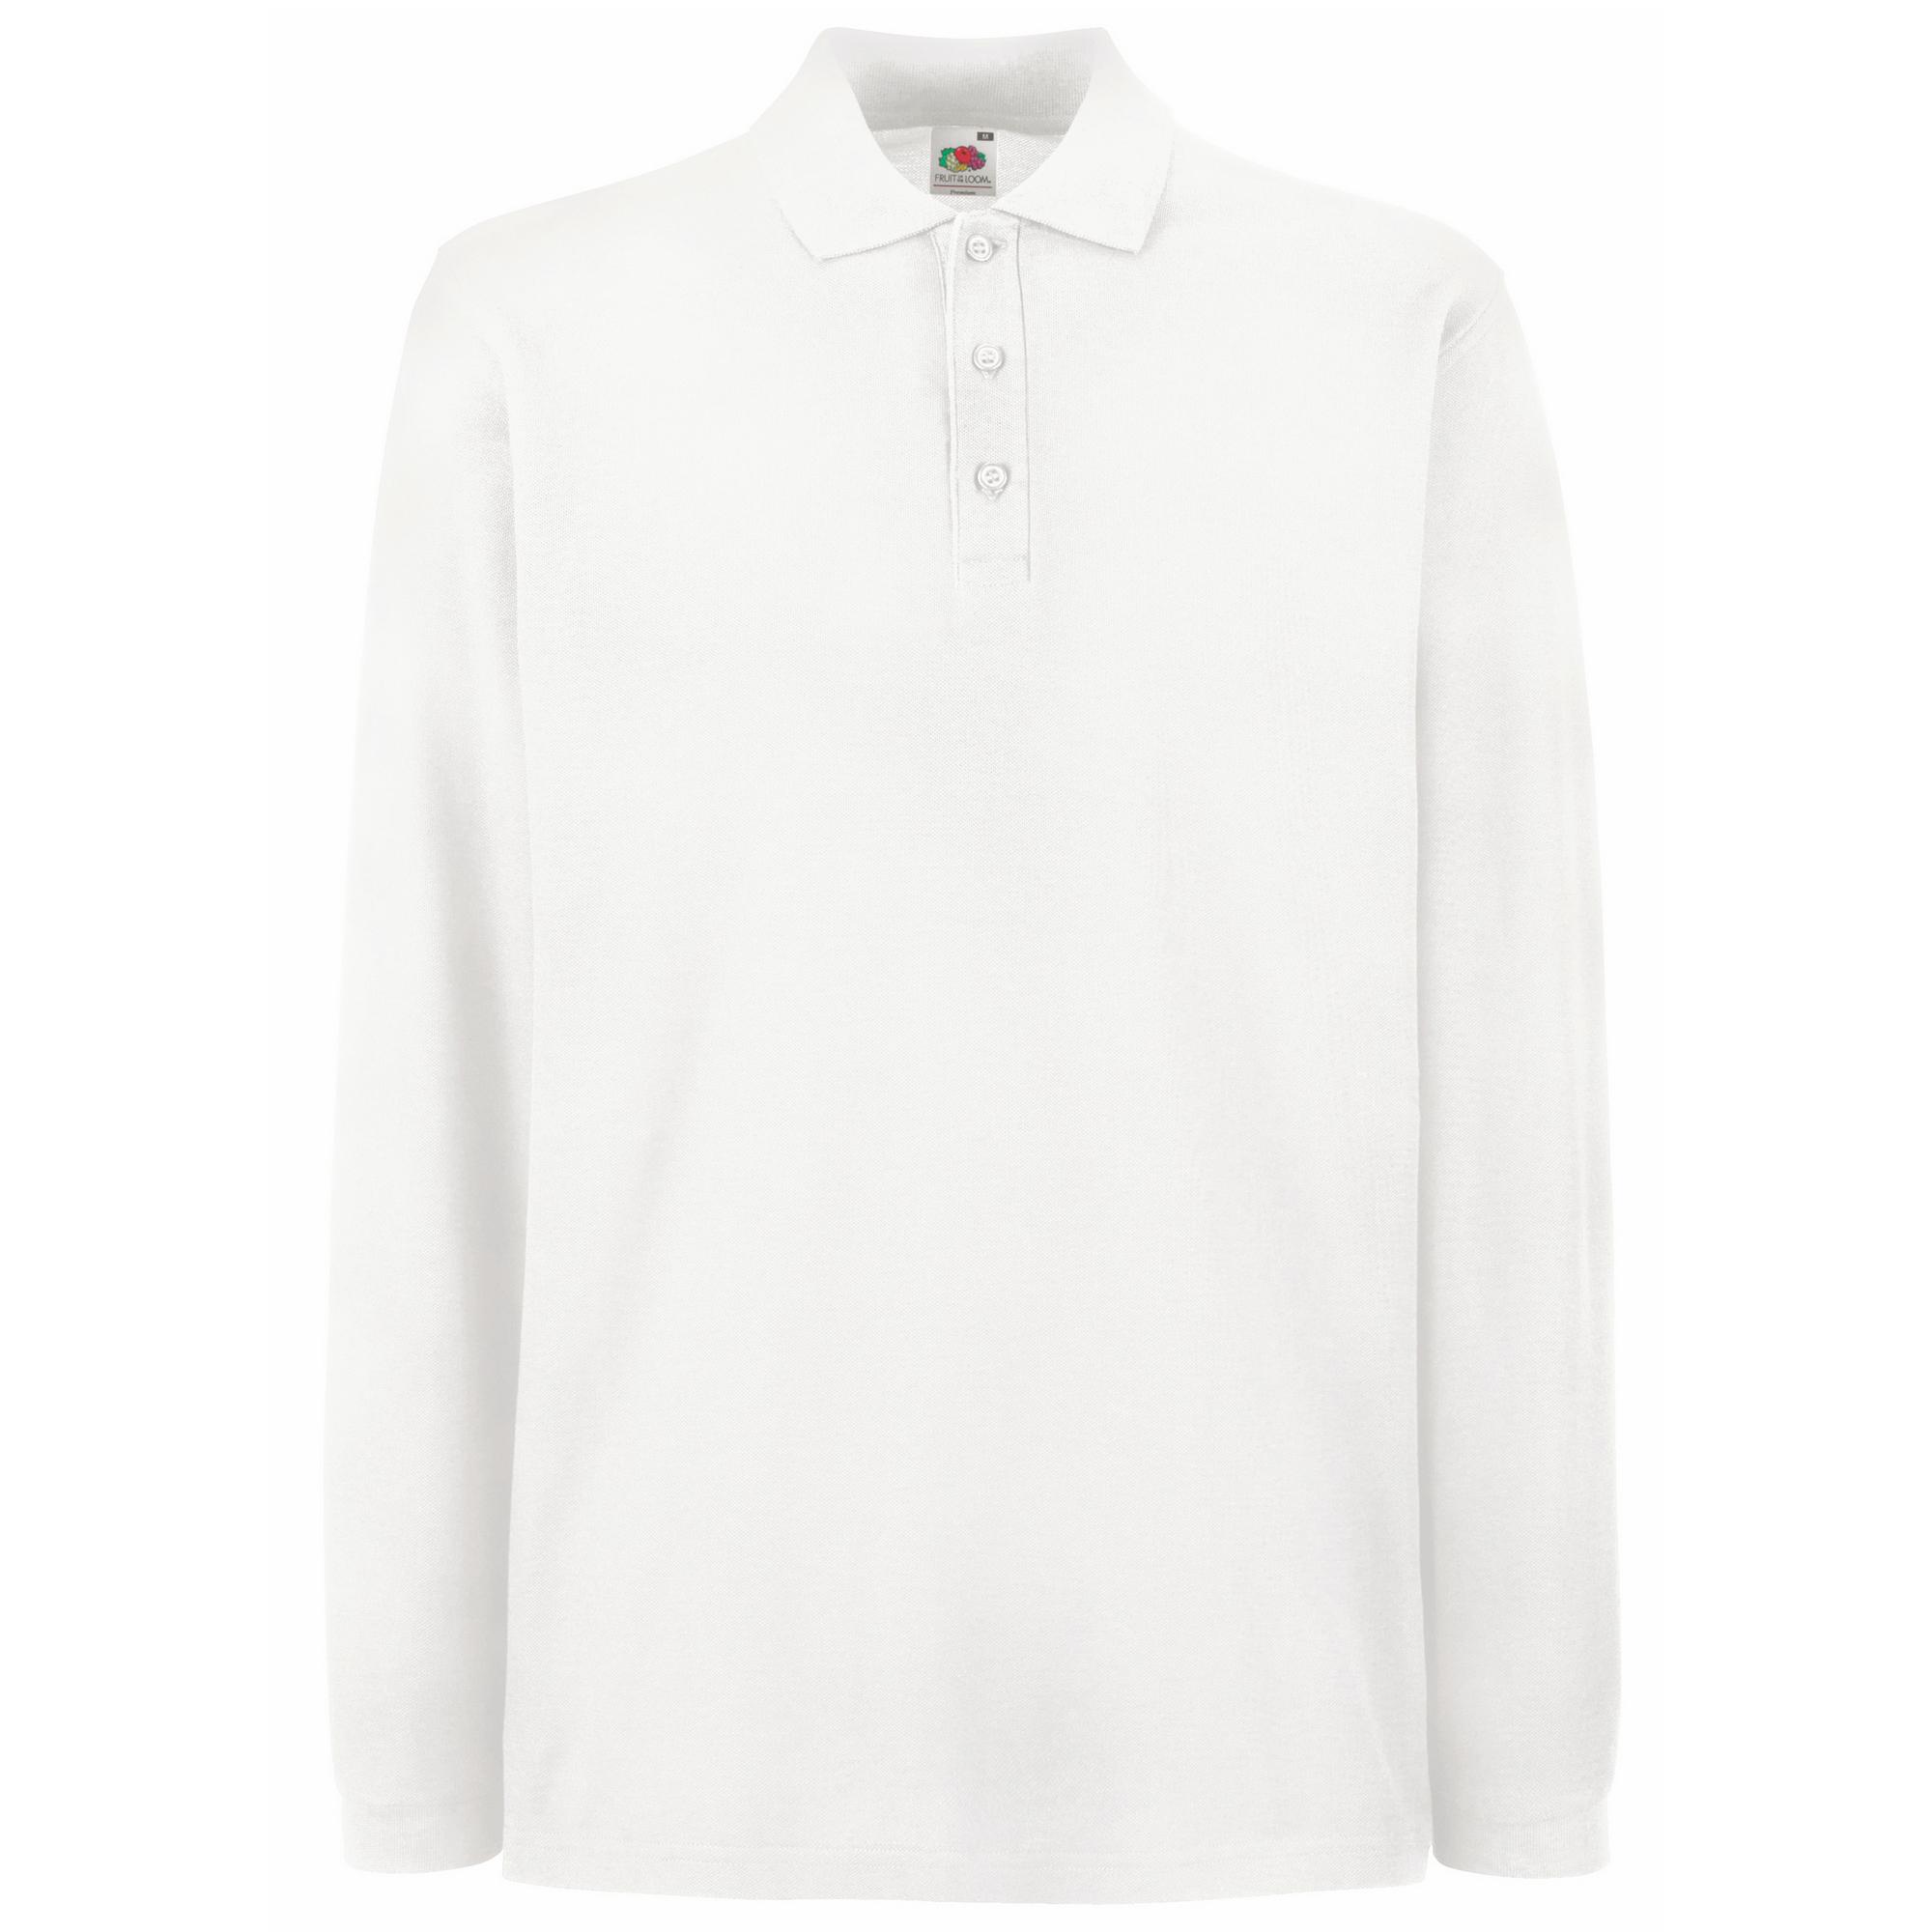 Fruit Of The Loom Mens Premium Long Sleeve Polo Shirt Ash Grey M Ebay